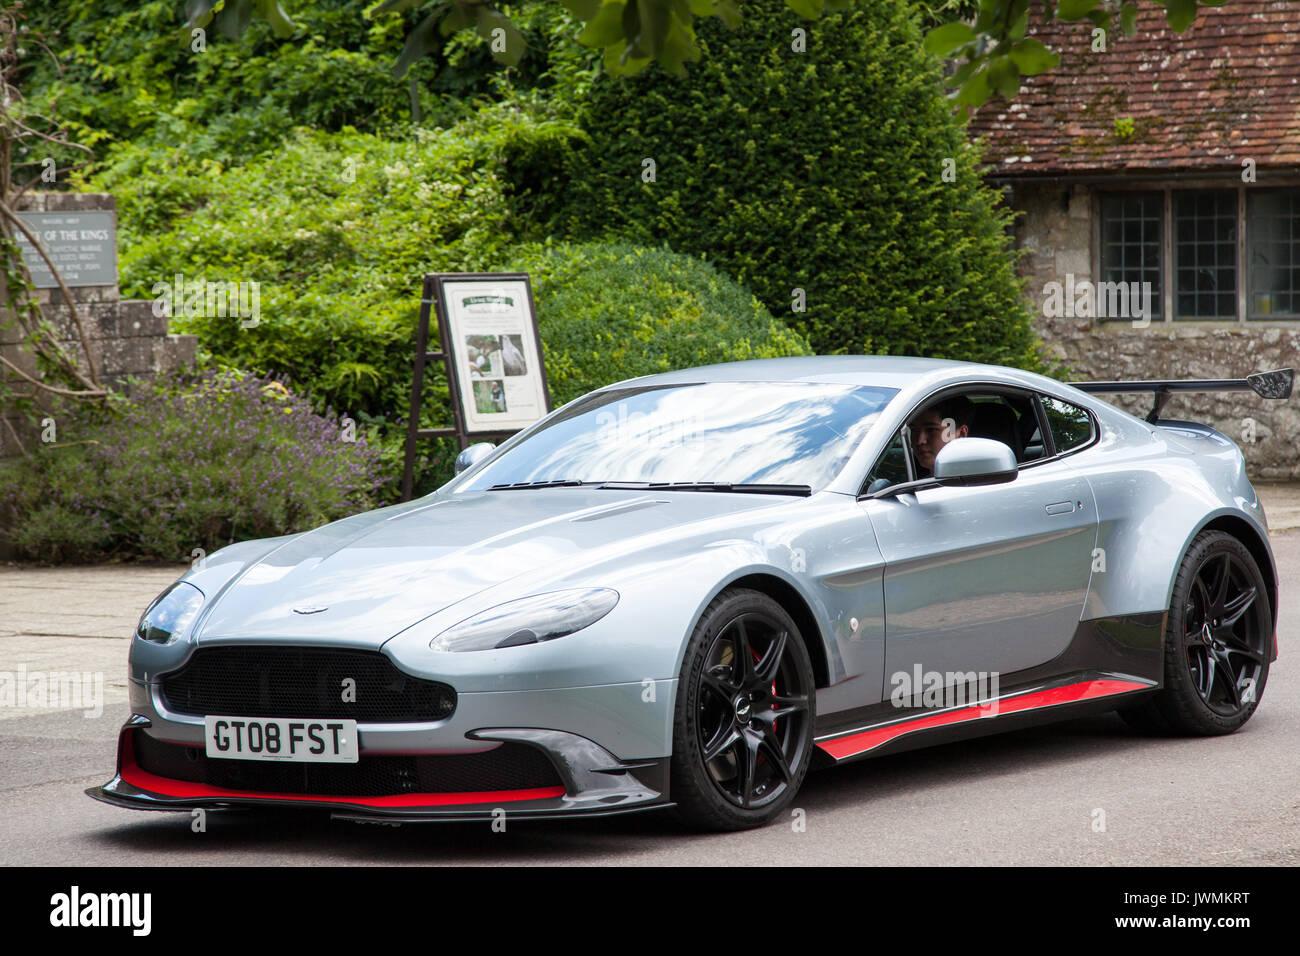 Aston Martin Vantage Gt8 2017 Fotografia De Stock Alamy